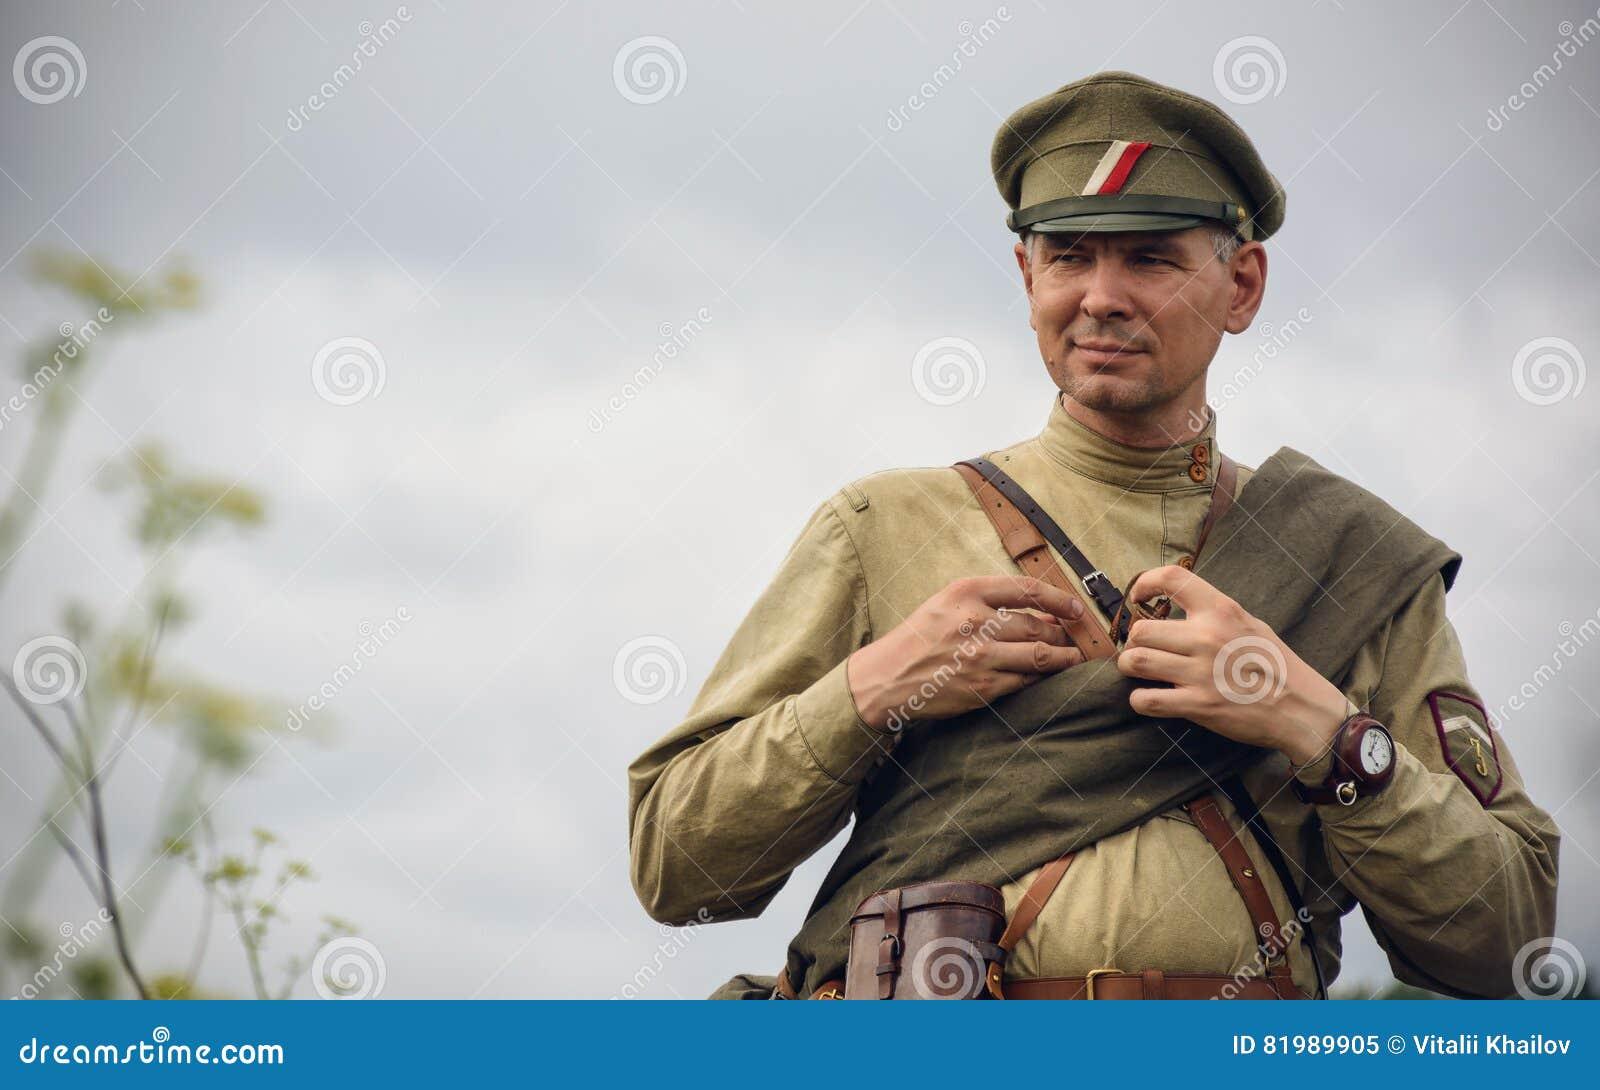 pokrovskoe sverdlovsk oblast russia july 17 2016